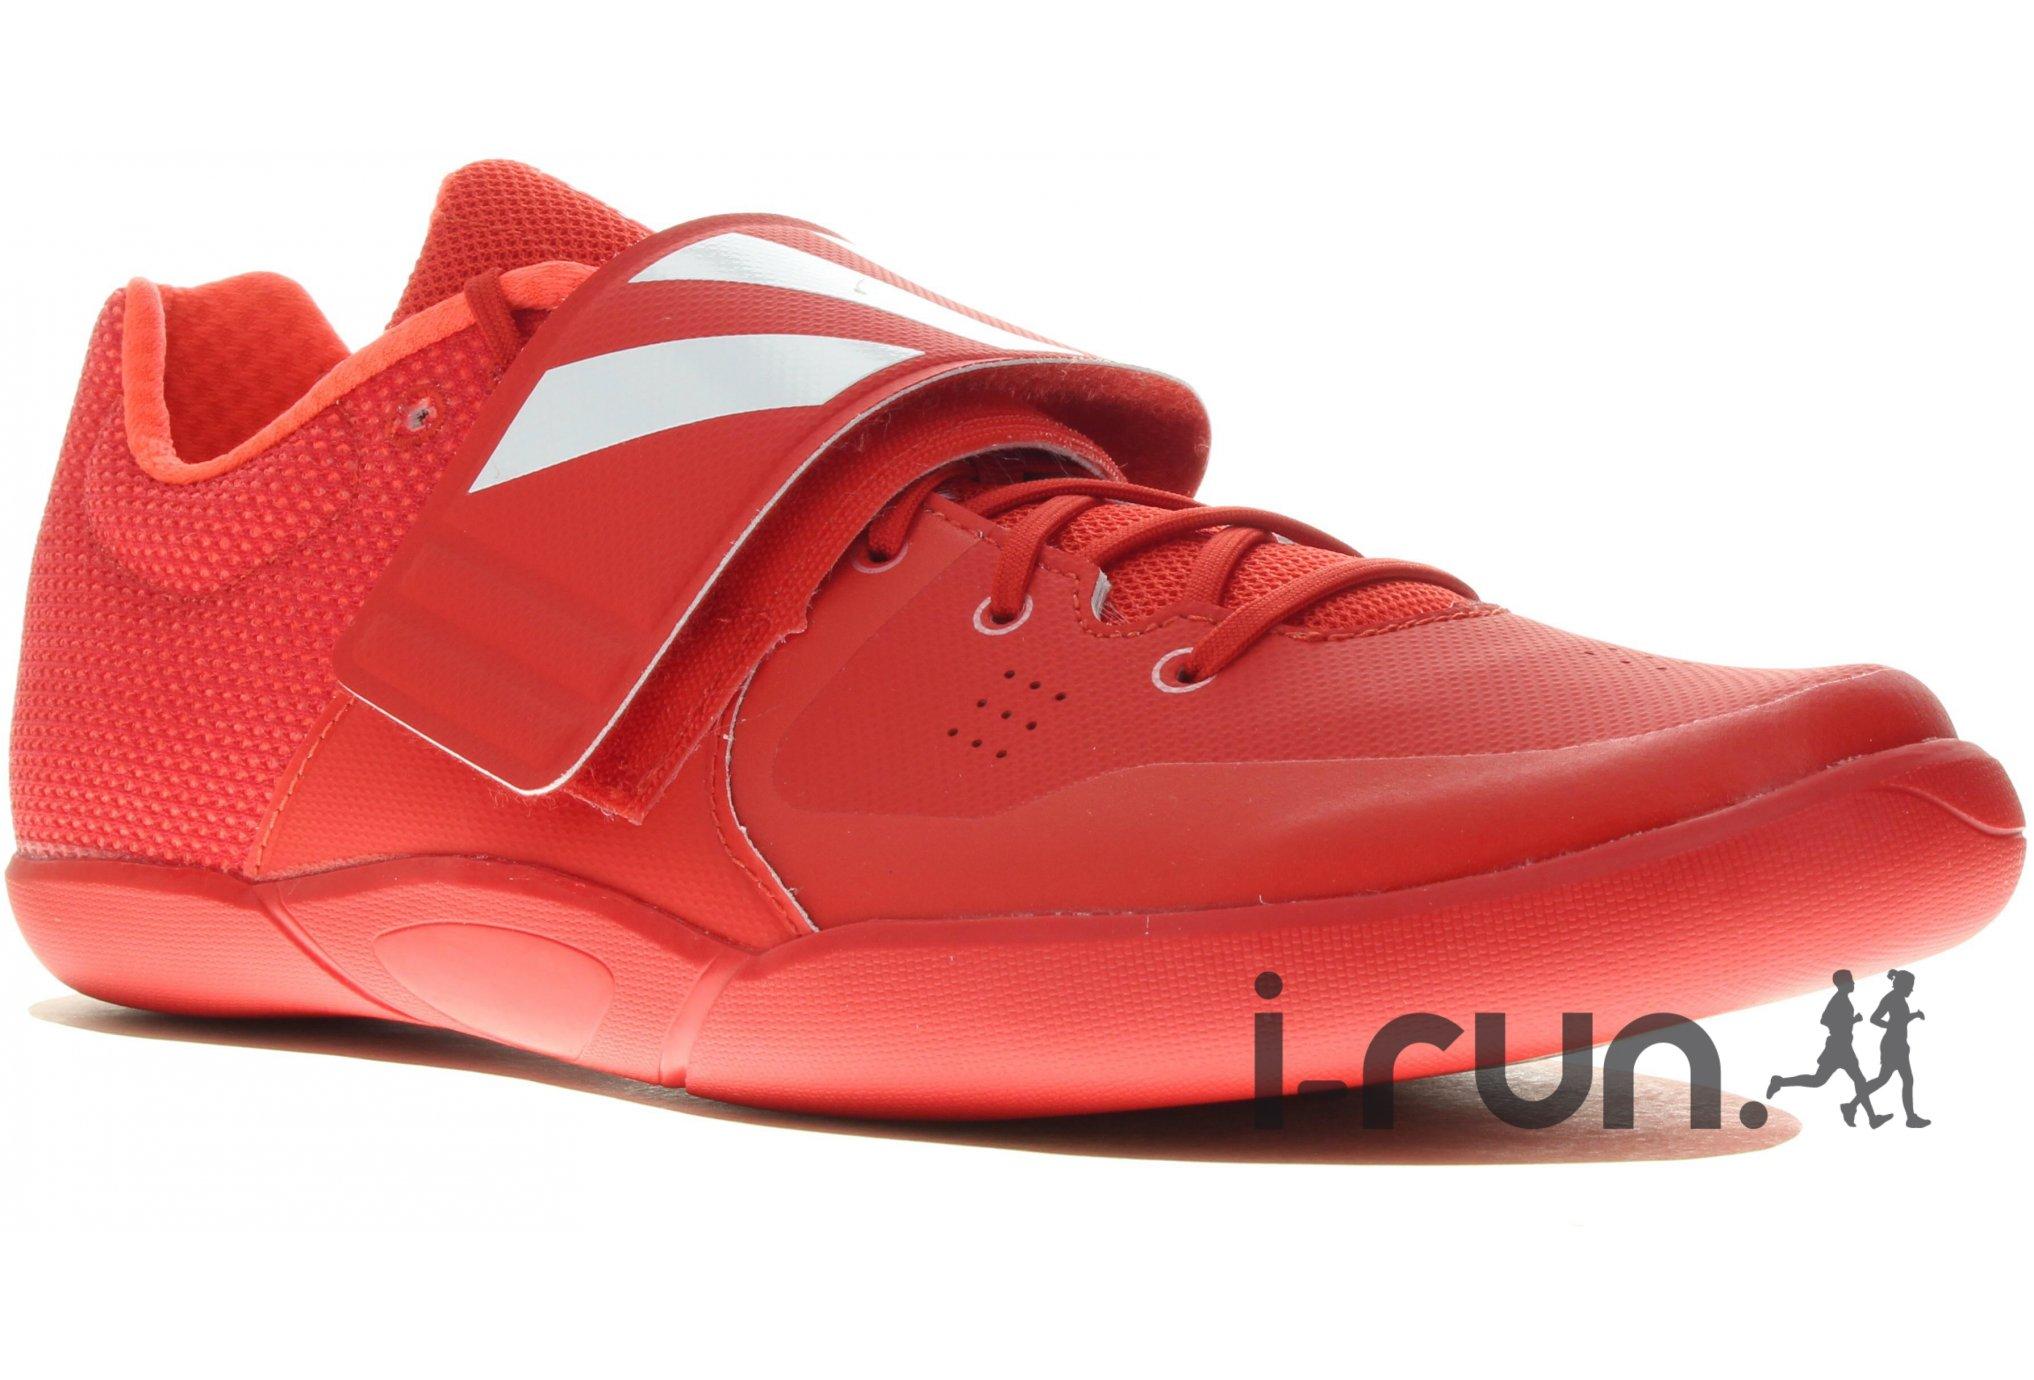 La Fortifiée adidas adizero Discus Hammer 2 M Chaussures homme